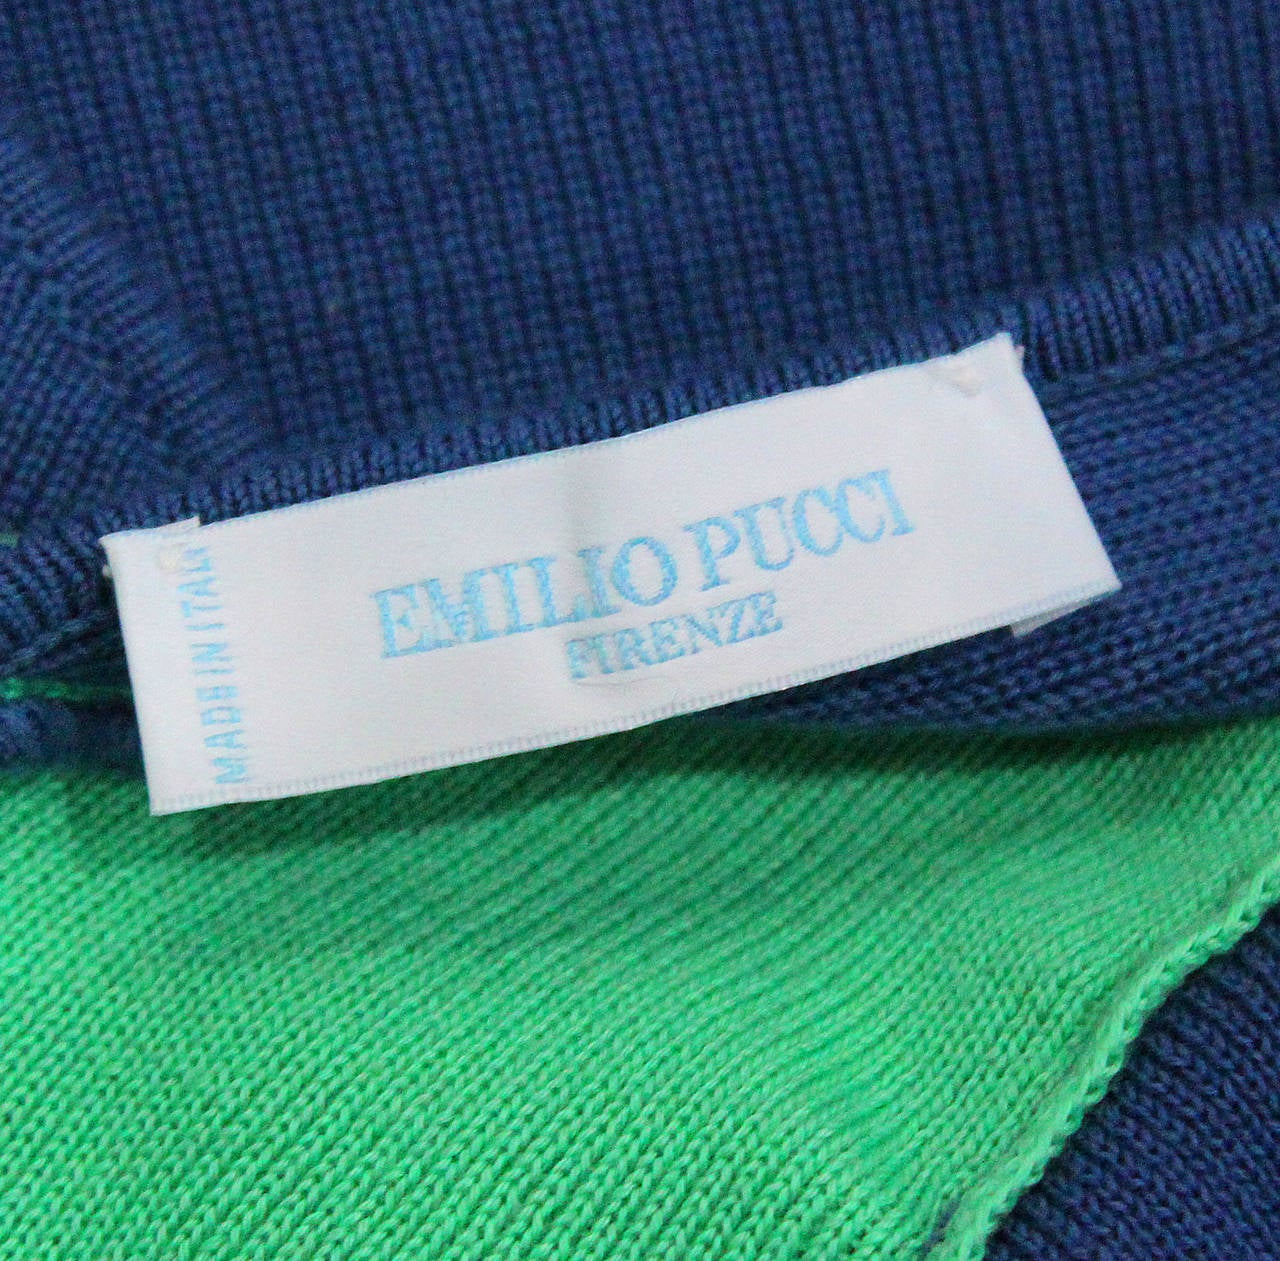 Emilio Pucci rib knit summer crop top. Circa 1990s 6